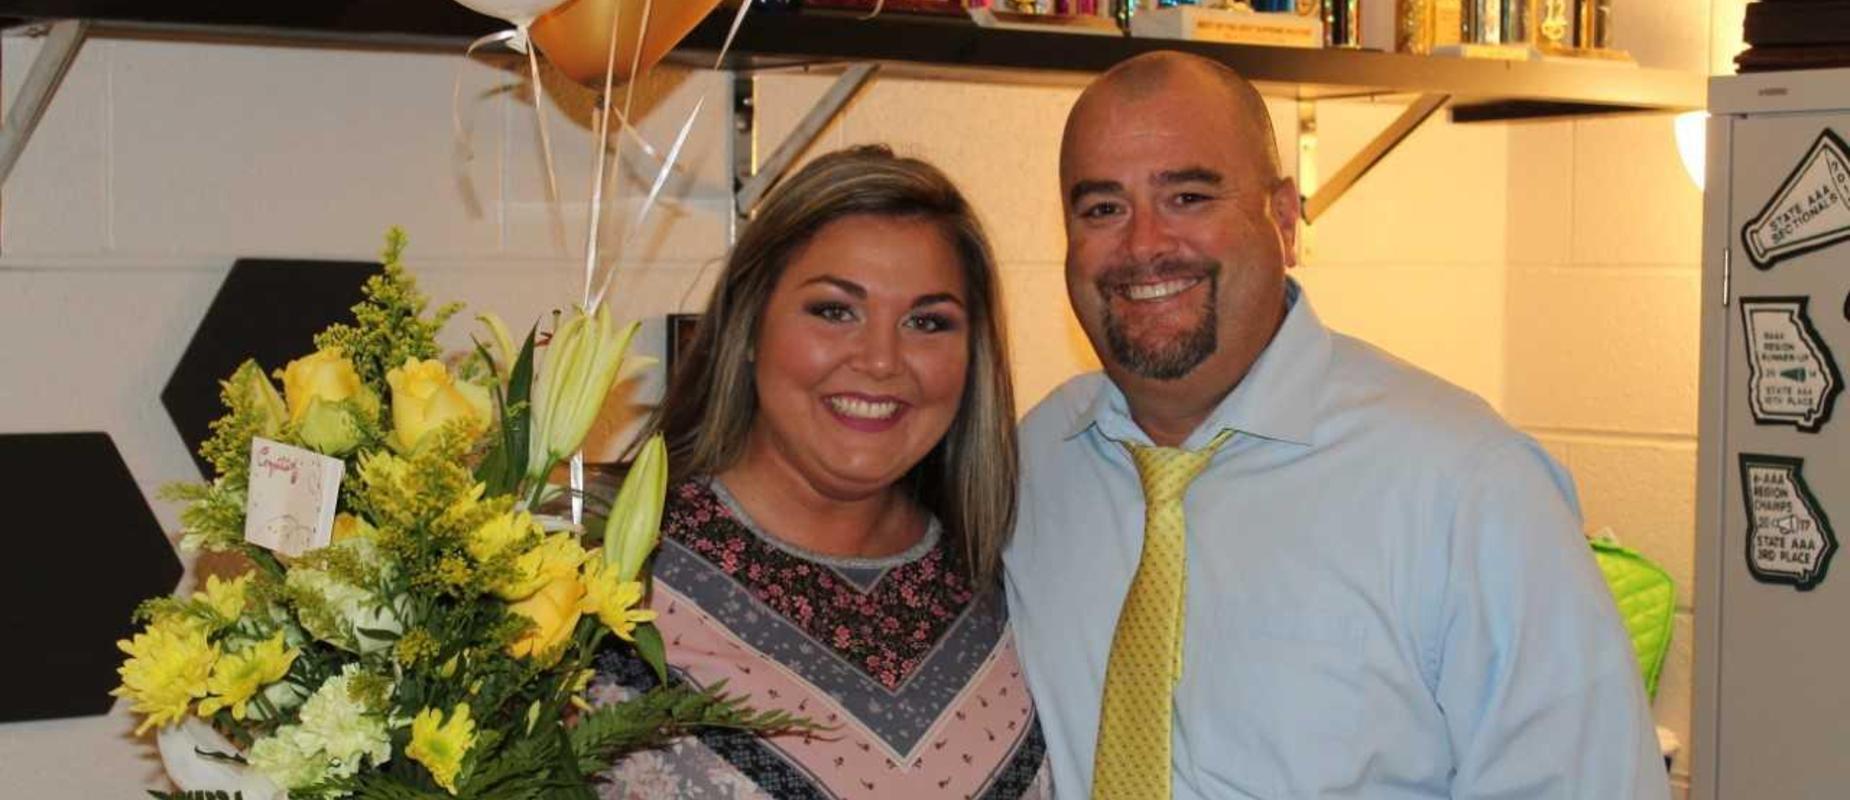 Kaylie Noe, Teacher of the Year